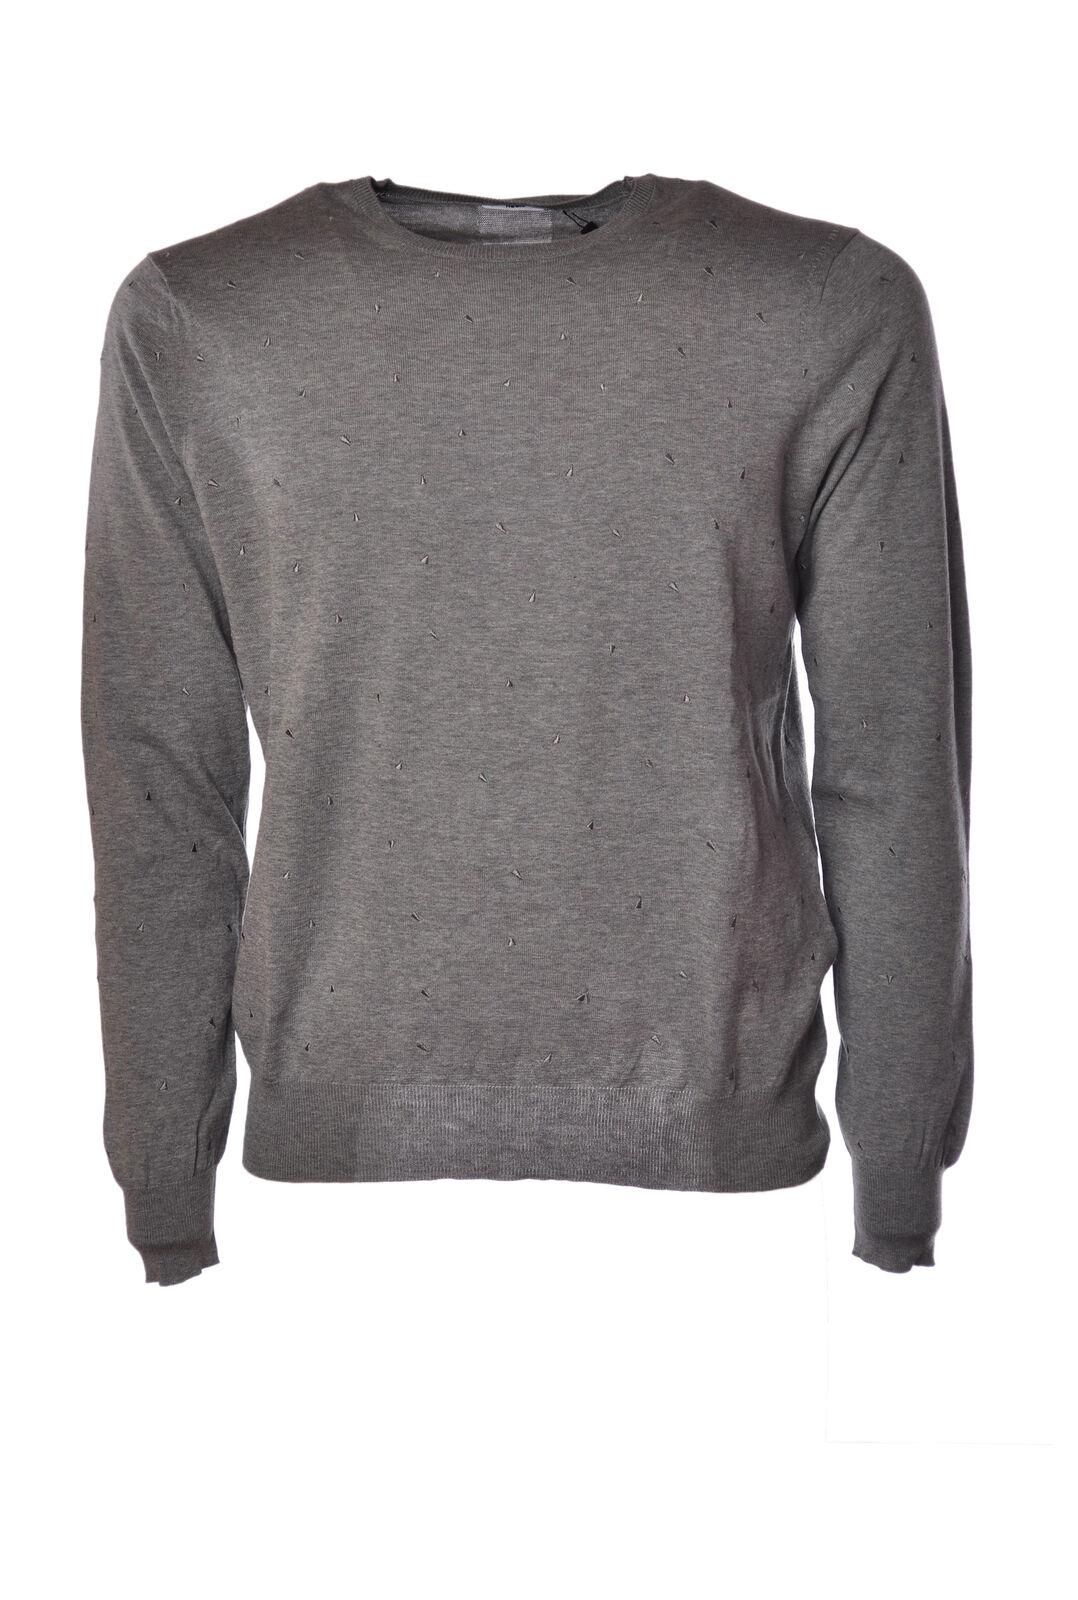 Hosio  -  Sweaters - Male - Grau - 1799810A184338